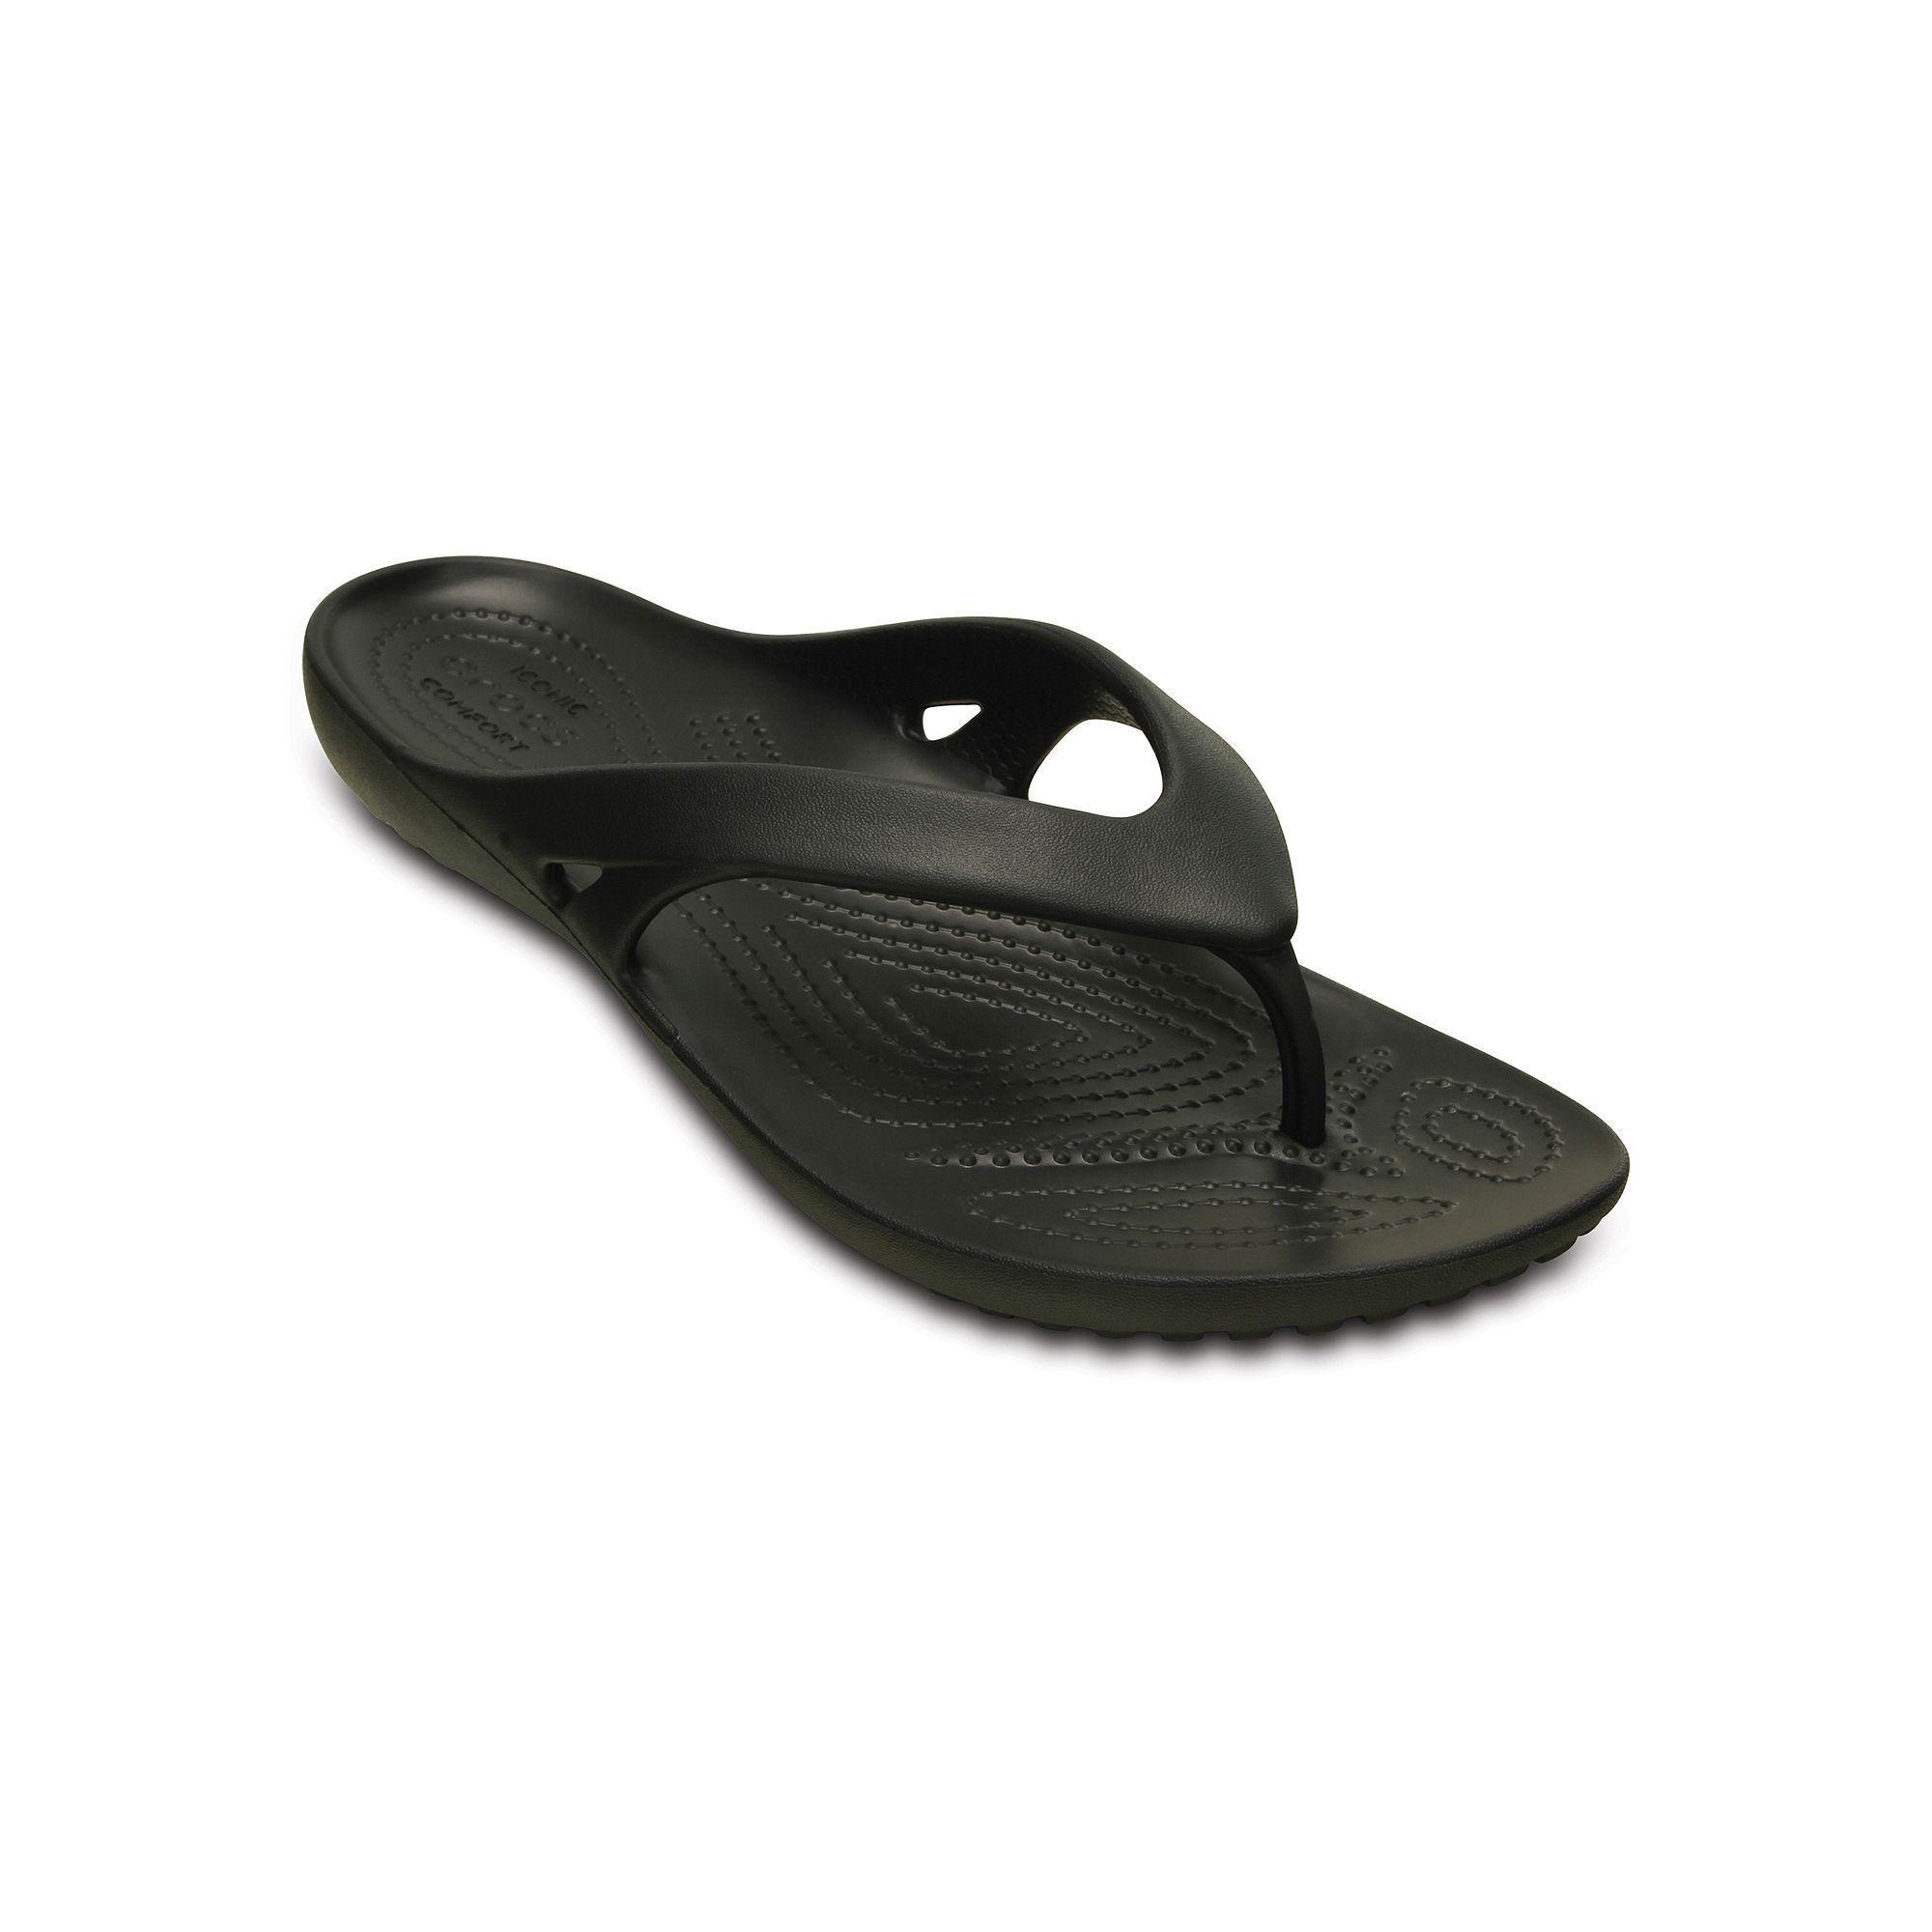 croc flip flops on sale